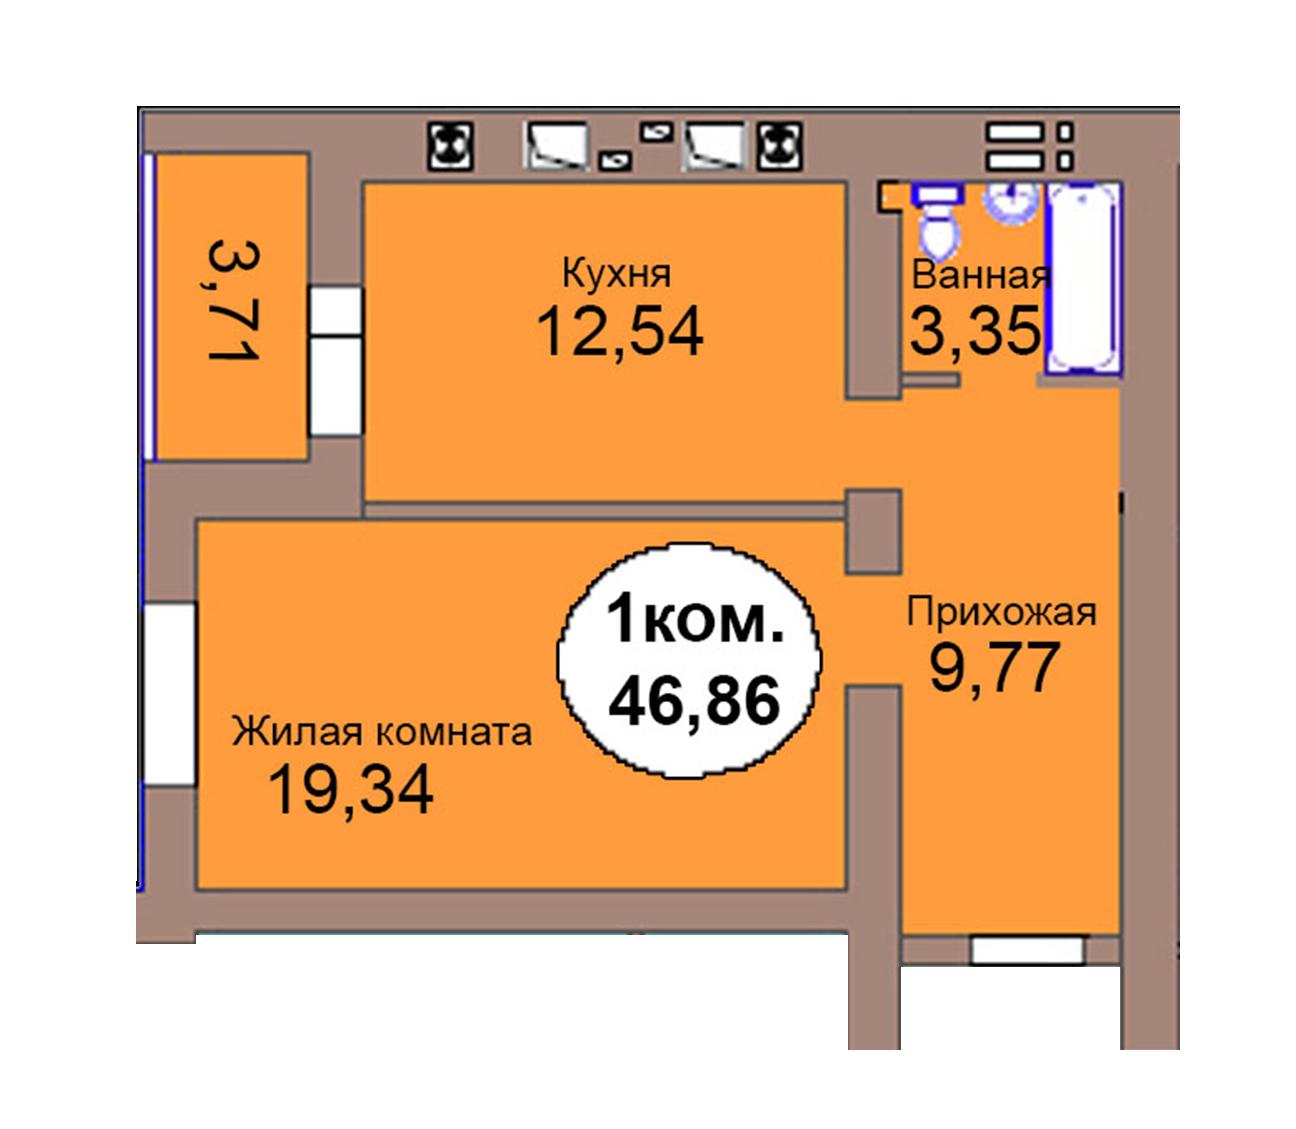 1-комн. кв. по пер. Калининградский, 4  кв. 95 в Калининграде